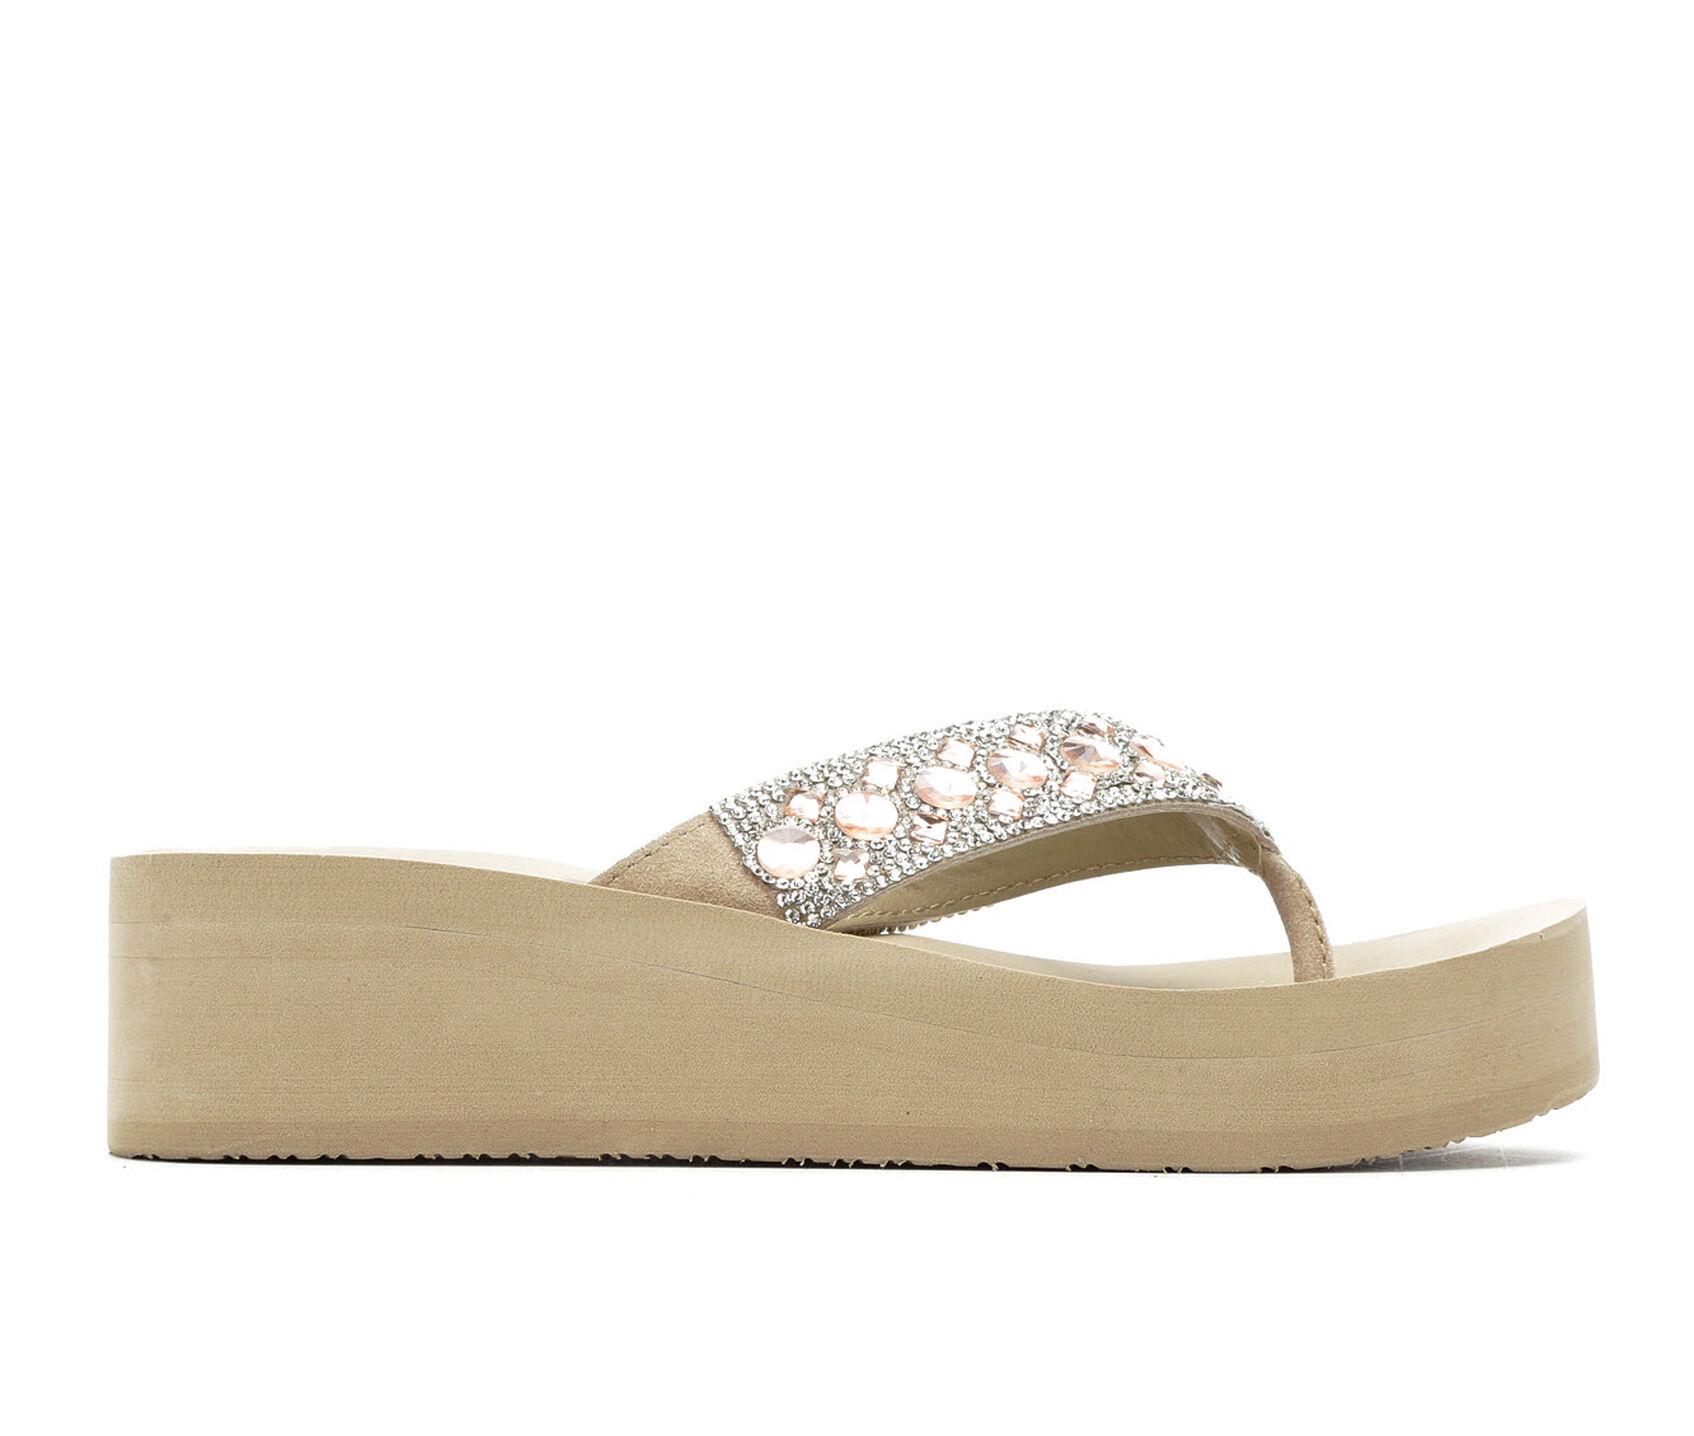 5f74987c22 Women's Yellow Box Rise Platform Sandals | Shoe Carnival